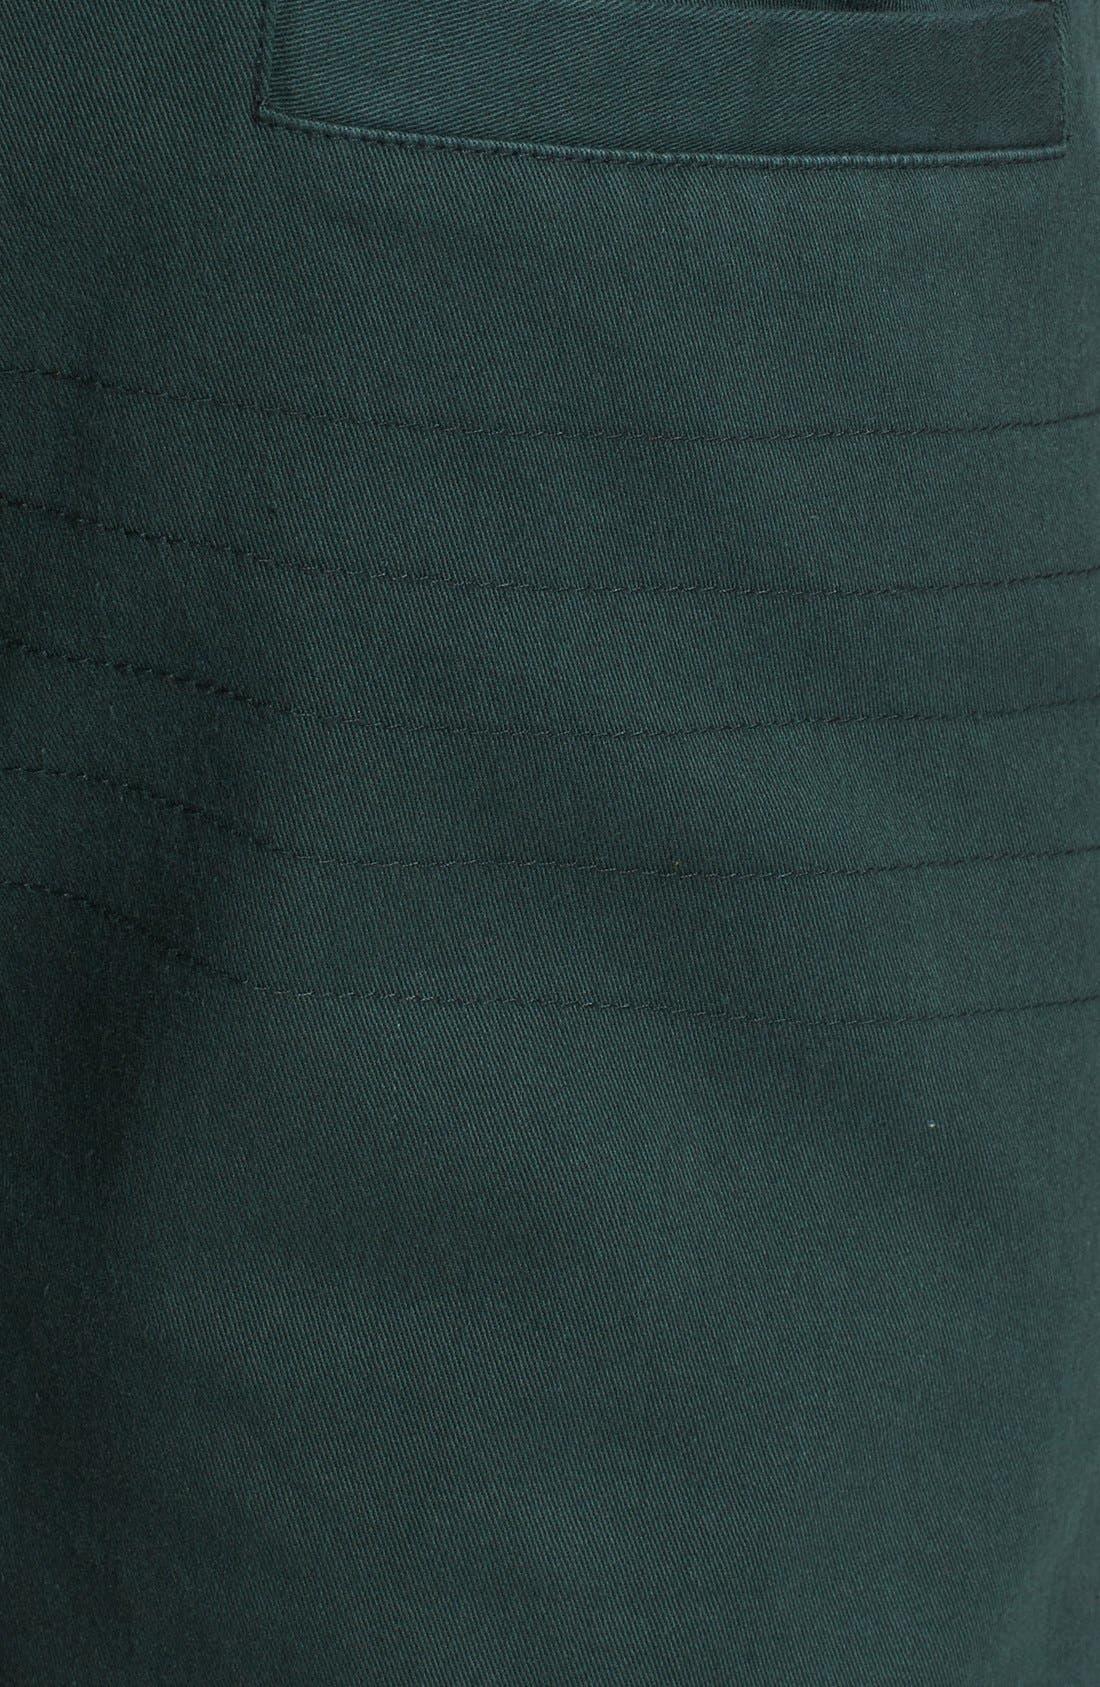 Alternate Image 3  - Vanguard 'Nu Wave' Shorts